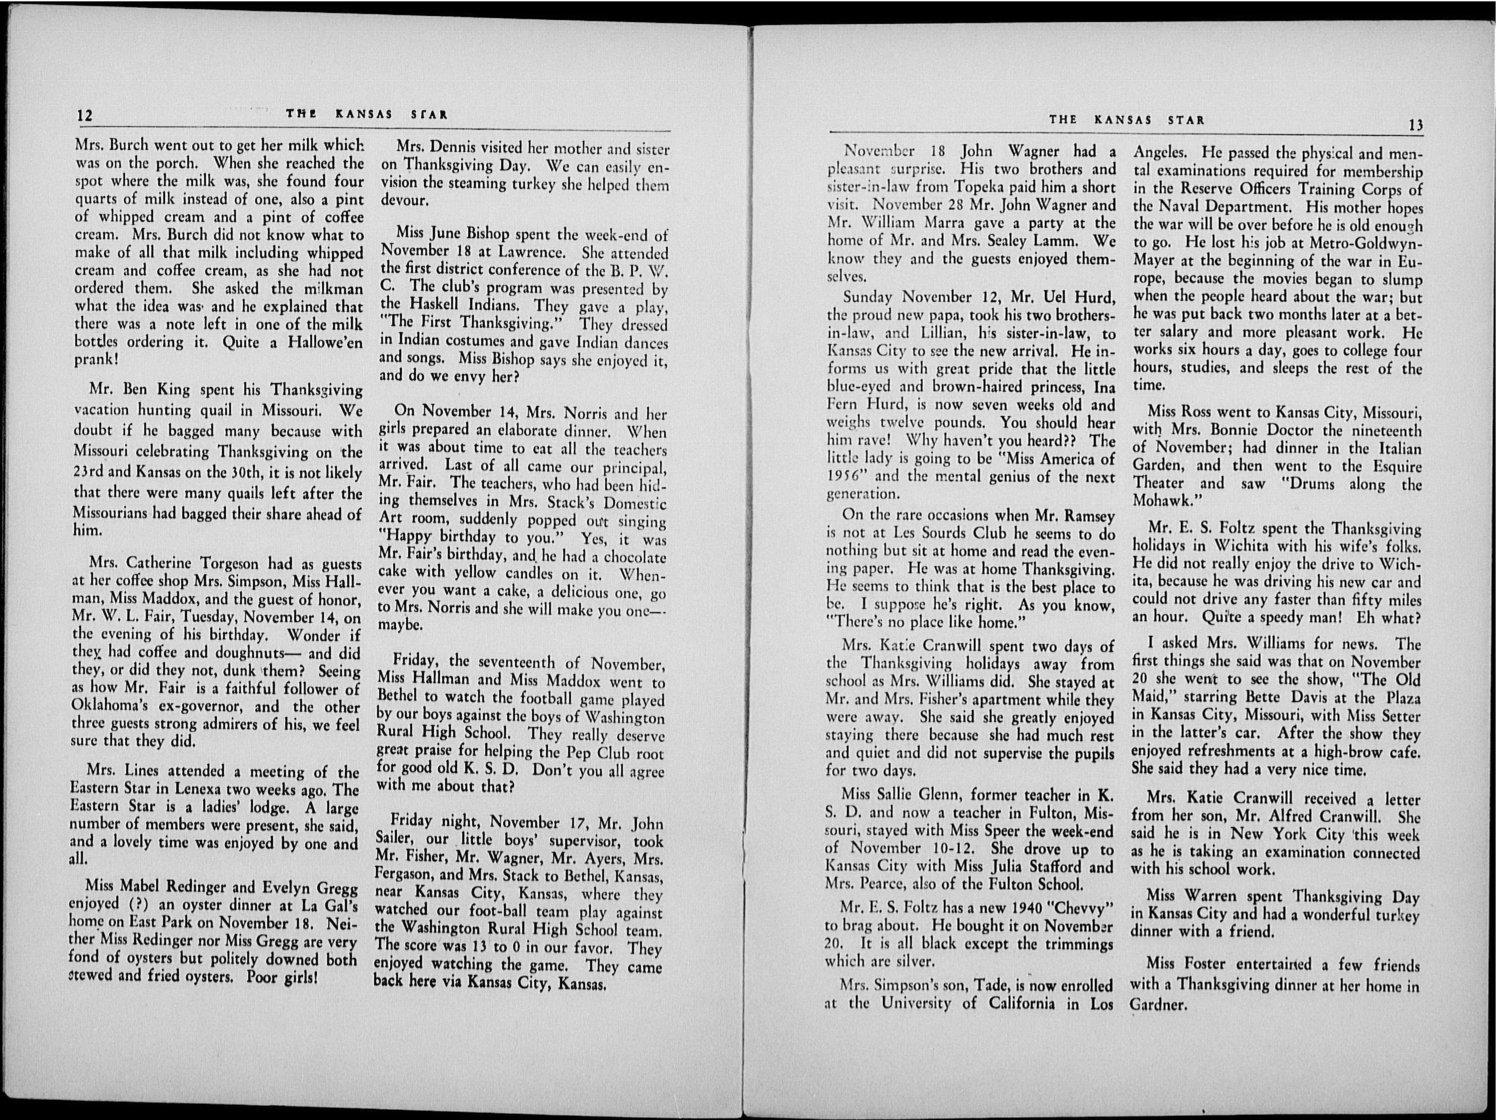 The Kansas Star, volume 54, number 4 - 12-13